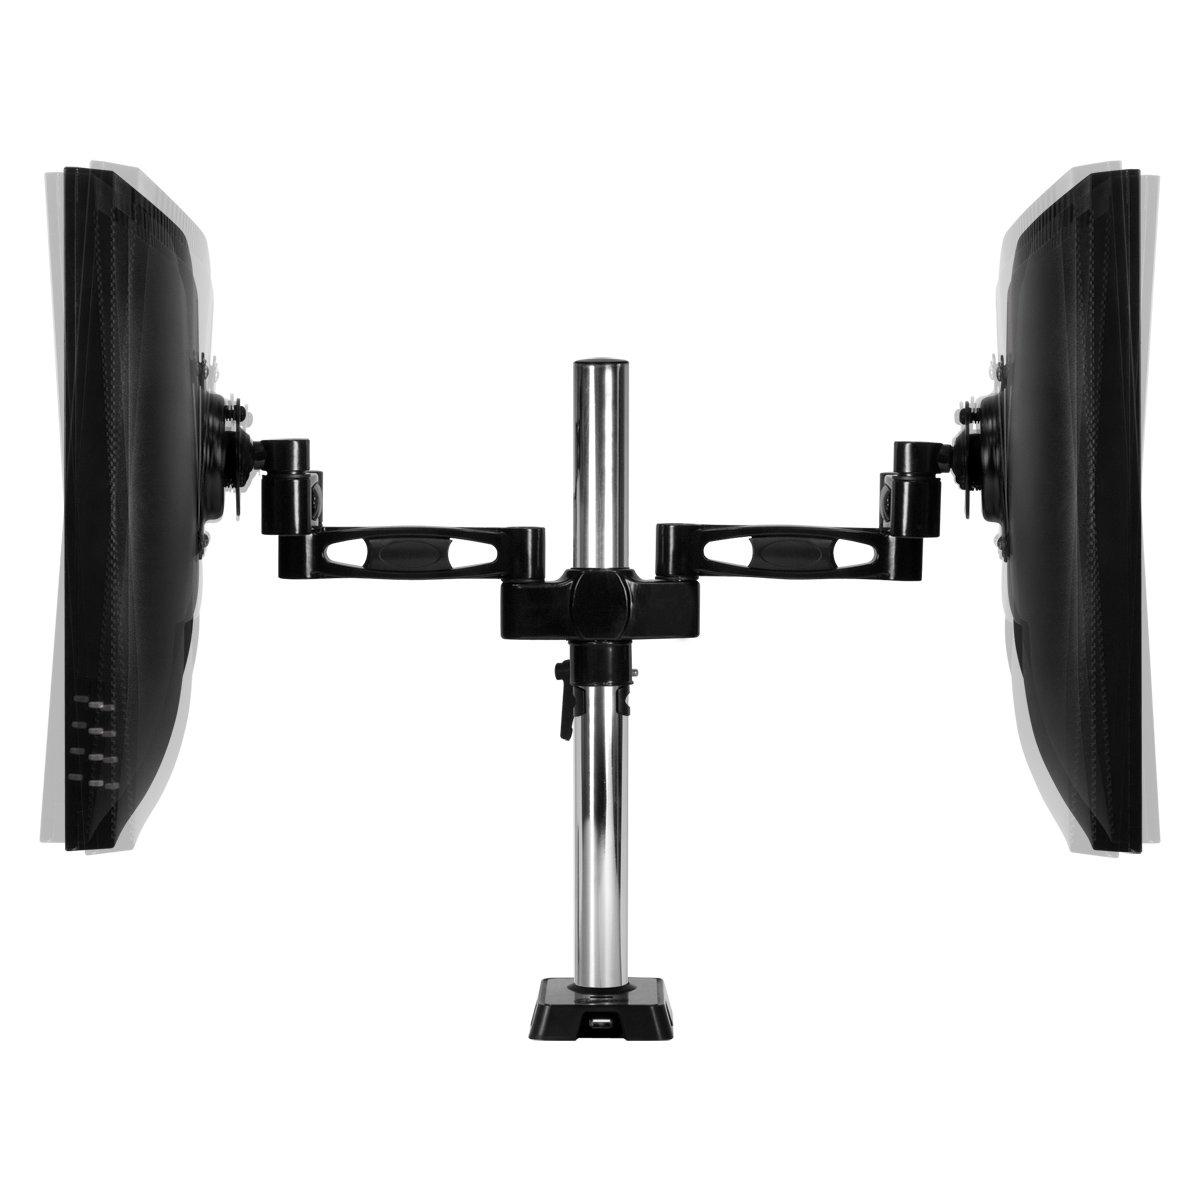 Logitech 980 000012 s120 2 piece black desktop computer speaker set - Arctic Z 2 Dual 3 Stage Monitor Arm Vesa 75 100 Compliant 4 Port Usb Data Hub Black Amazon Ca Computers Tablets